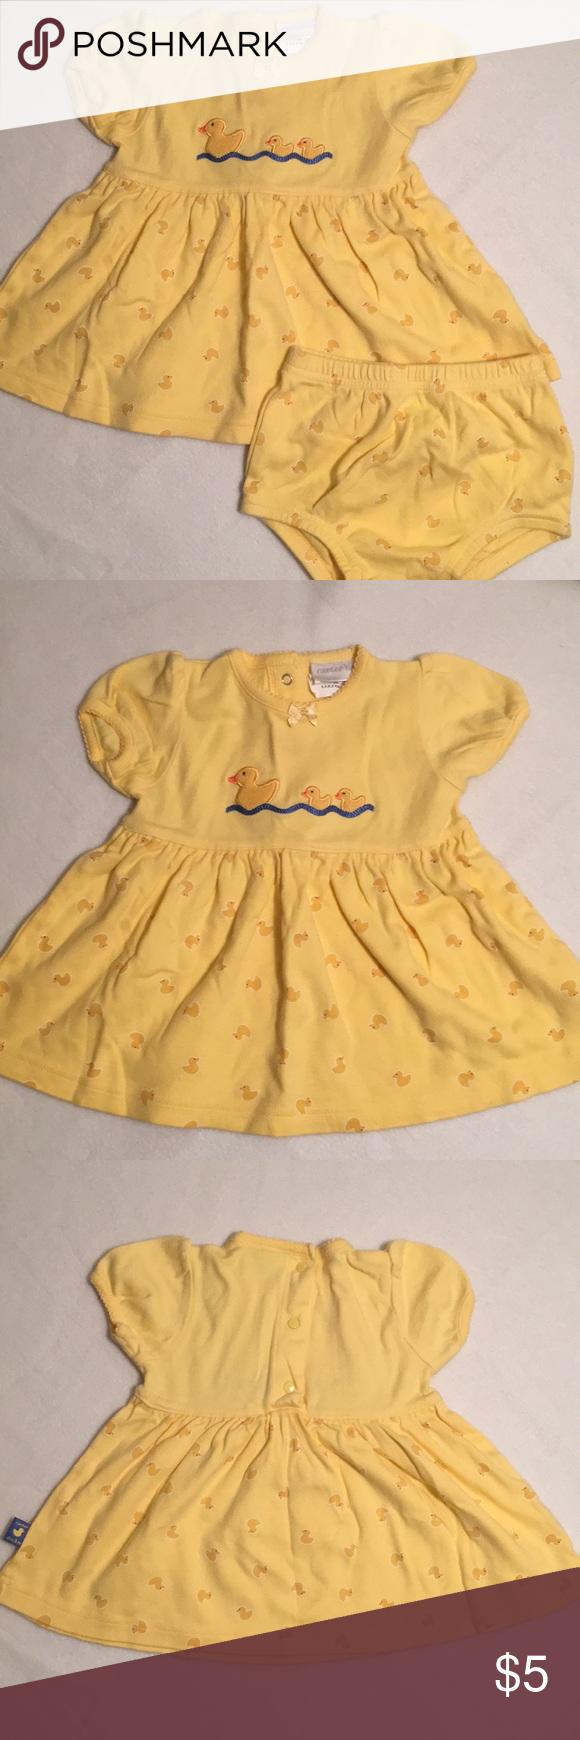 Yellow dress 3-6 months  Carterus  piece infant Duckie Set Carterus  Piece Duckie Set size